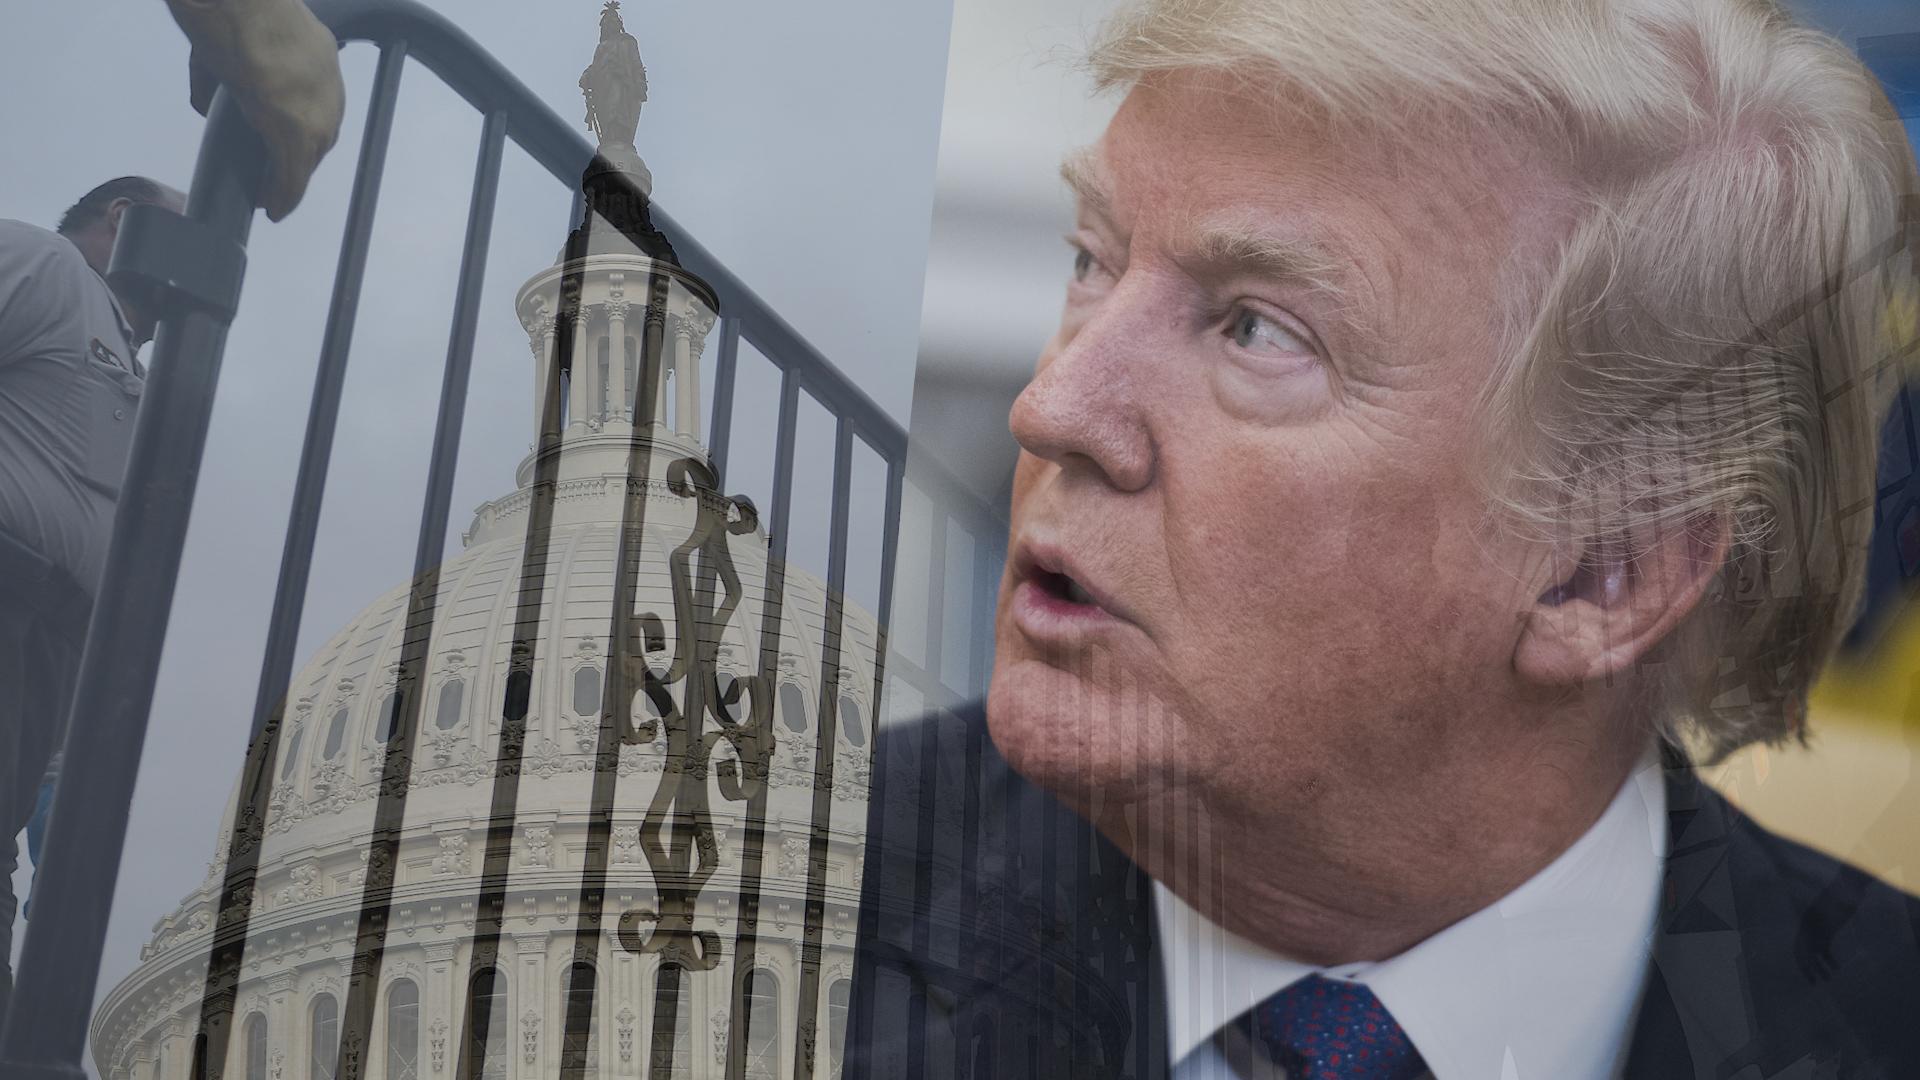 Shutdown looms as Republicans seek short-term spending deal for government